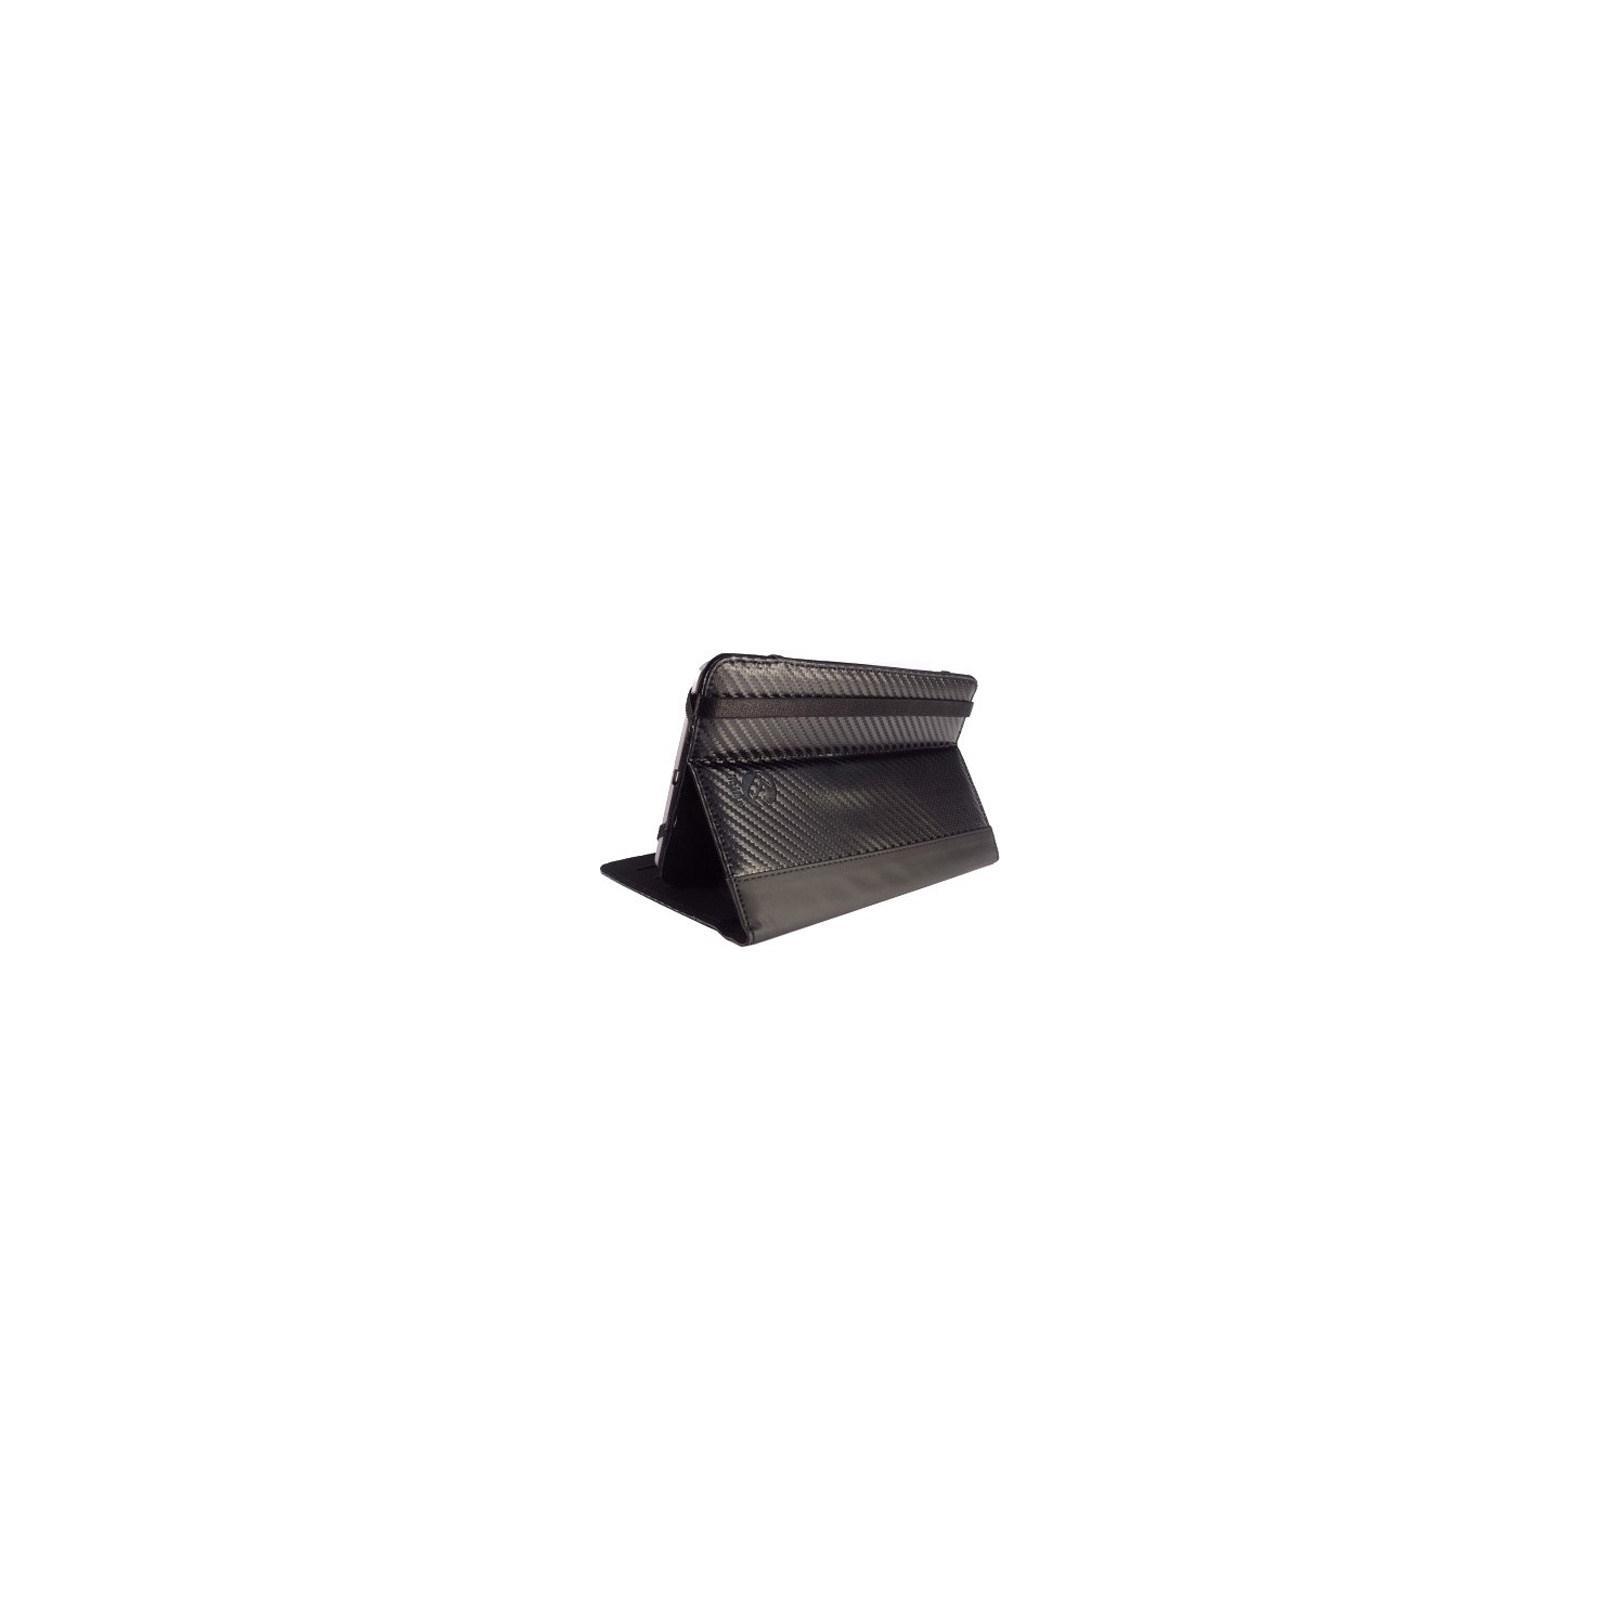 Чехол для планшета Tuff-Luv 7 Slim-Stand Black Carbon (J14_9) изображение 2